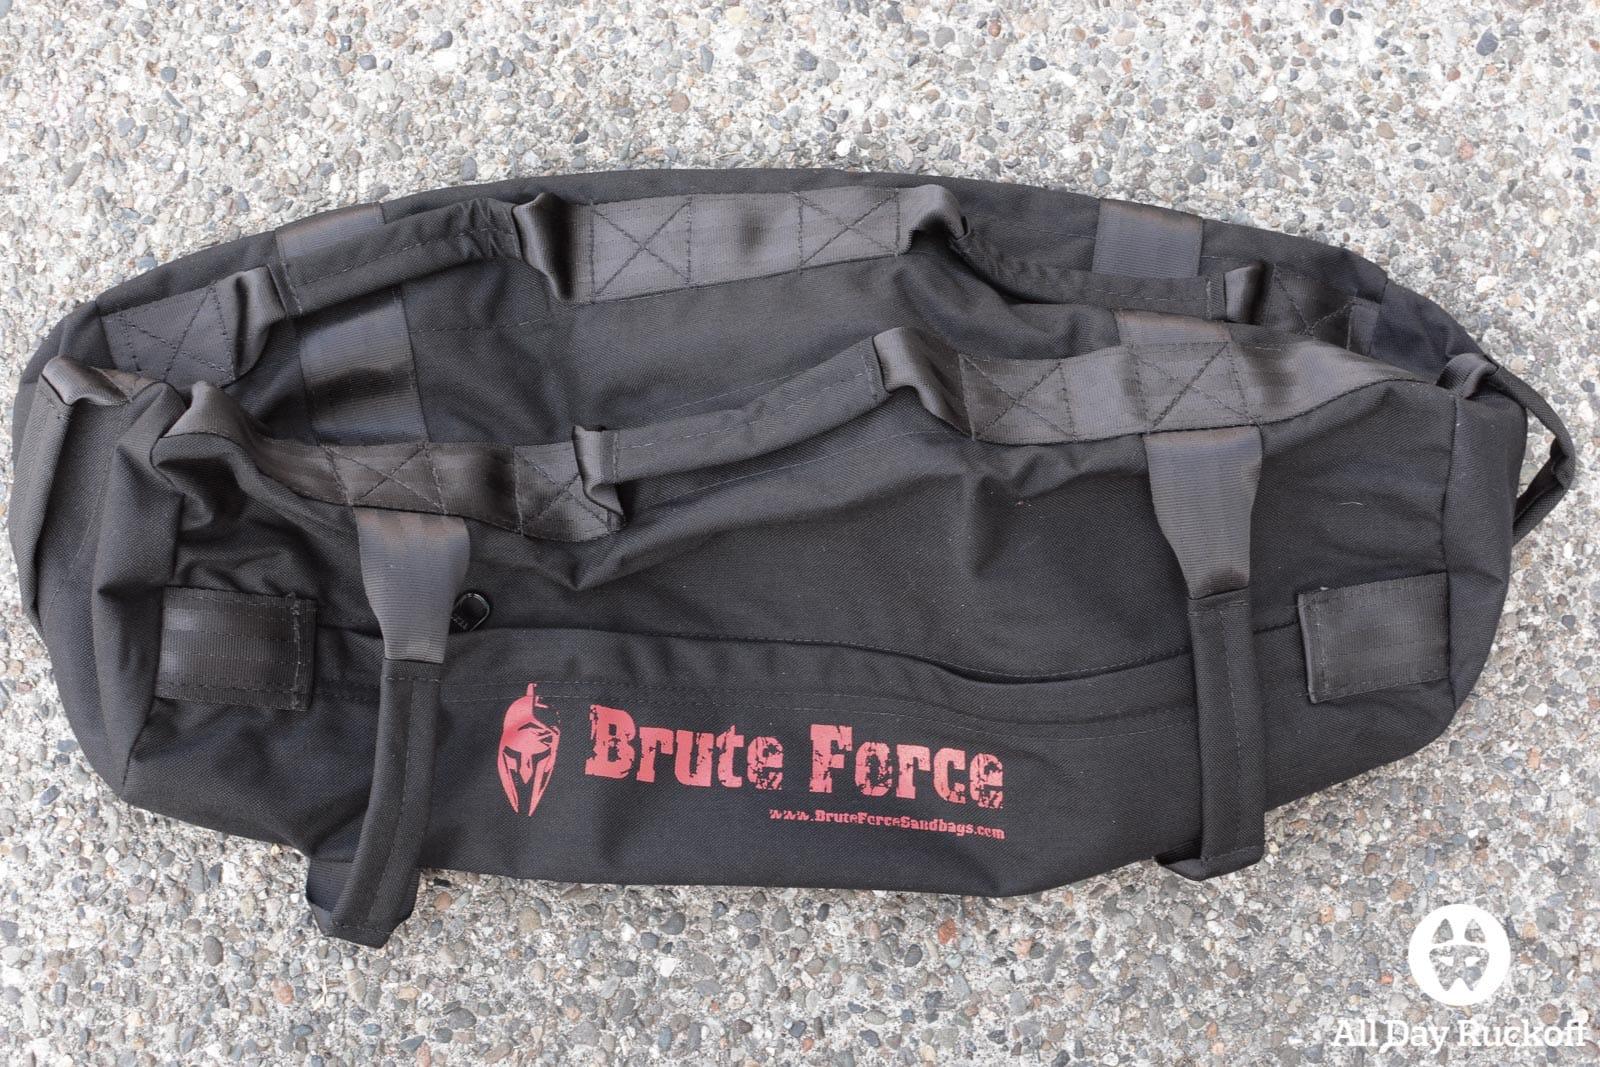 Brute Force Athlete Sandbag - New Top